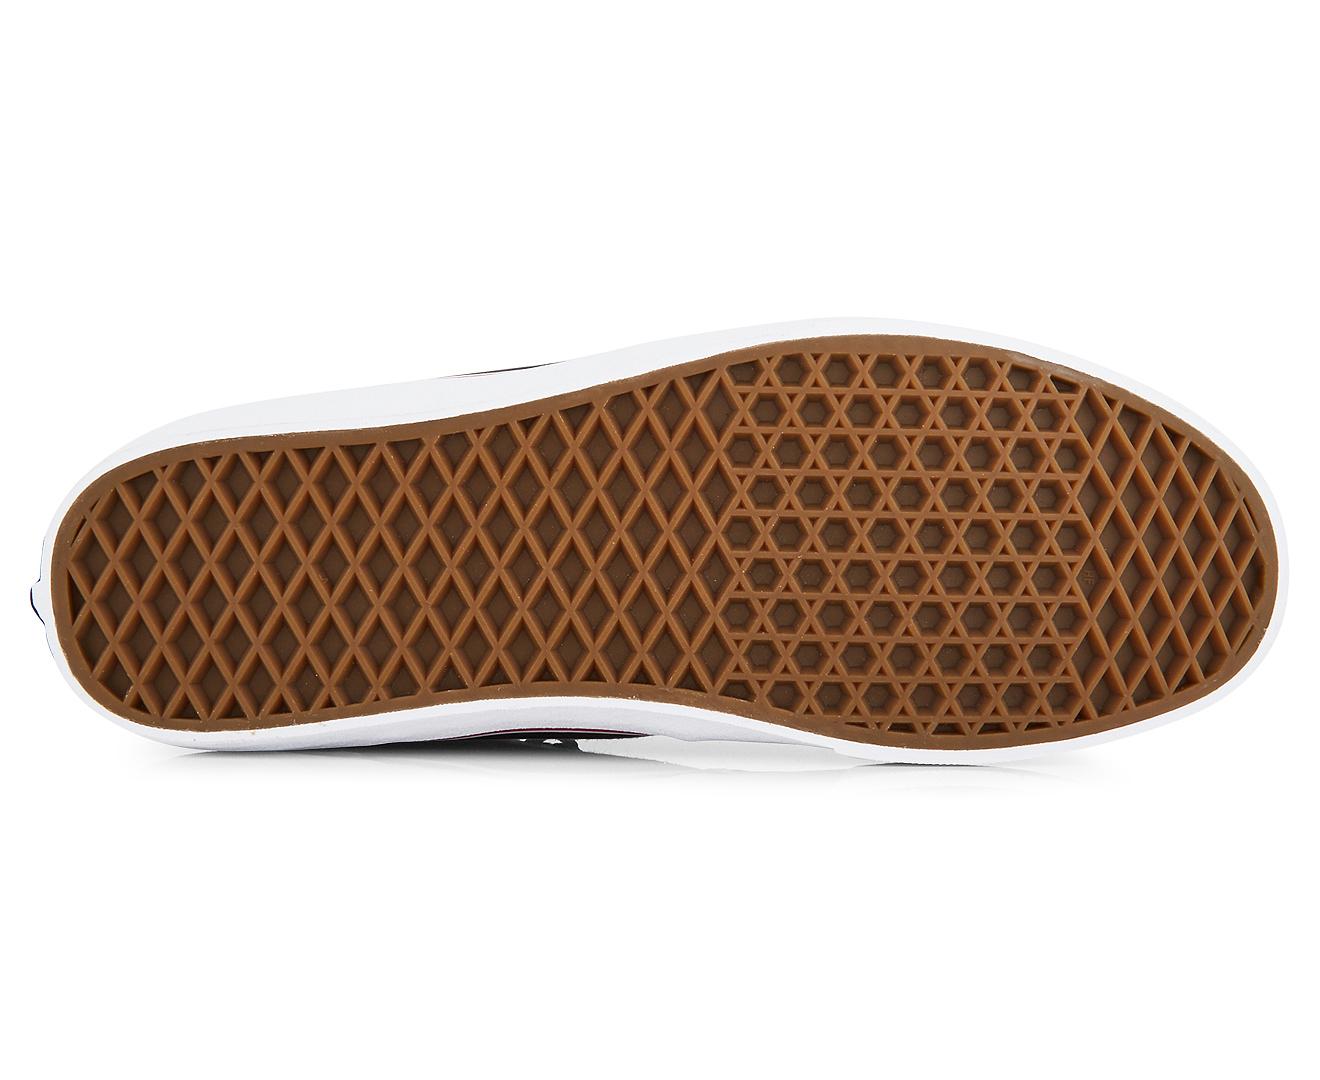 2ed303cc2cb2e8 Vans Men s Atwood Hi Rock Textile Shoe - Black Red